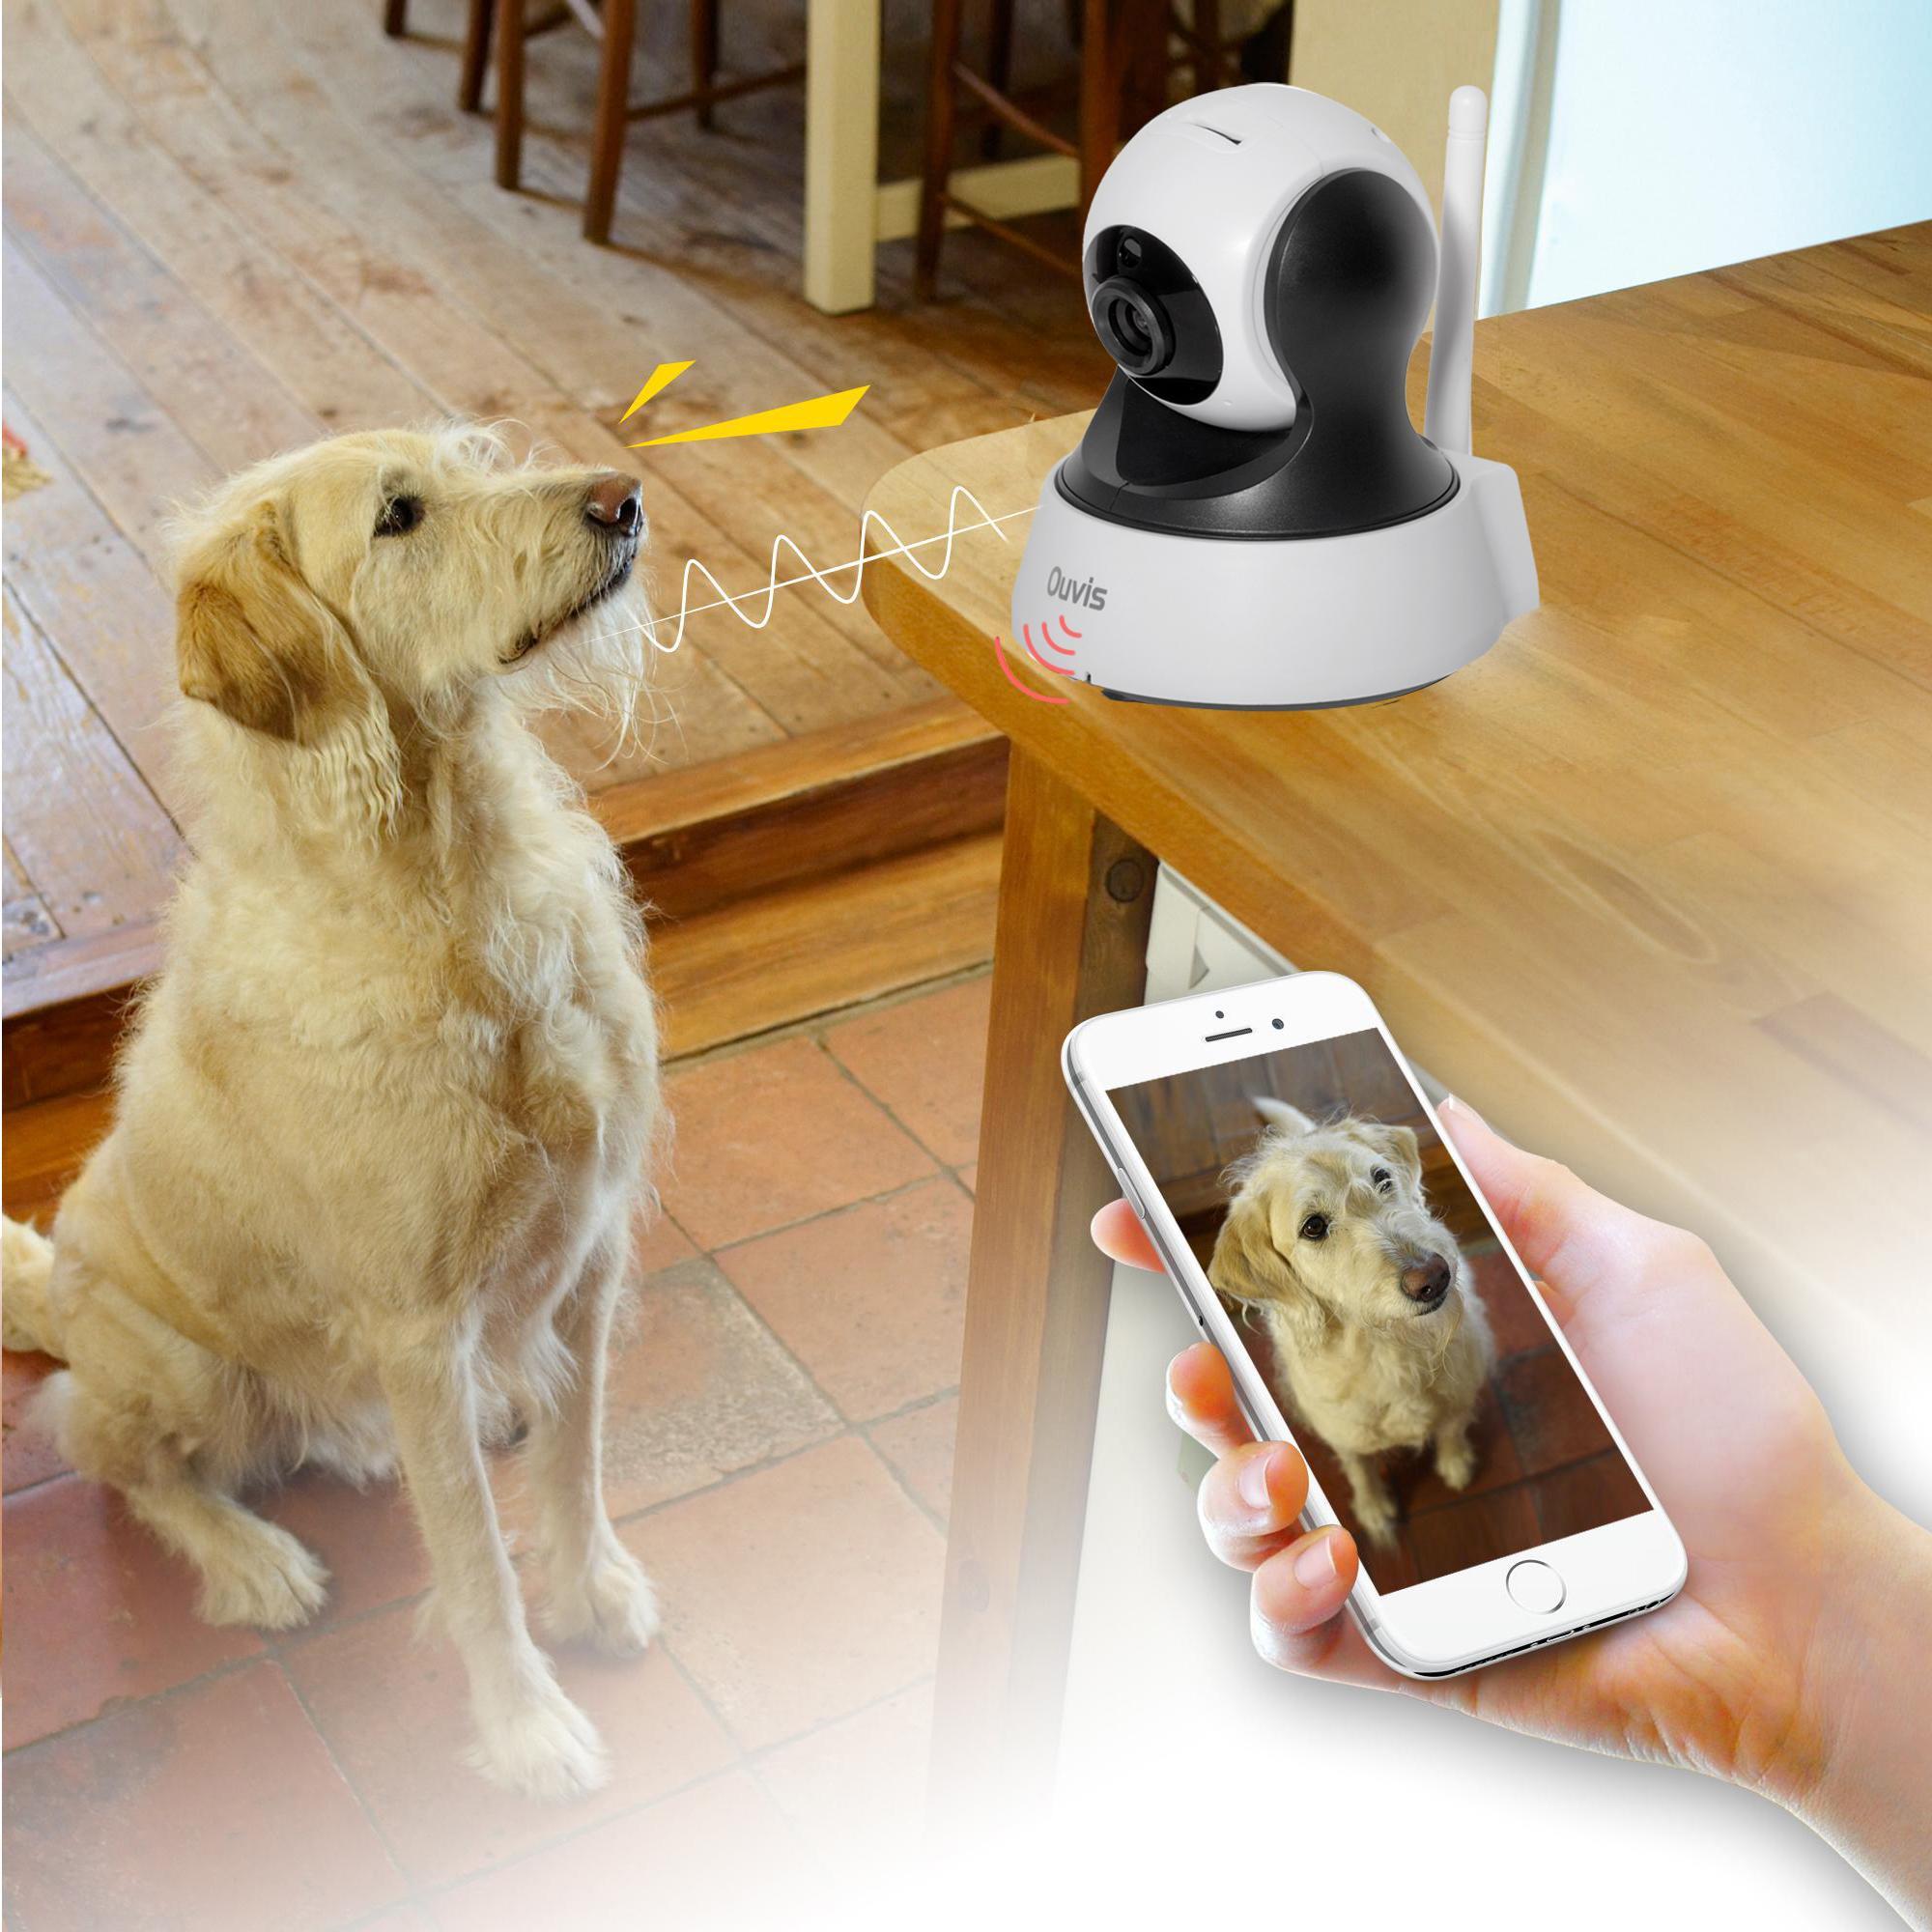 Amazon Com Ouvis V3 Wireless Security Camera 720p Wifi